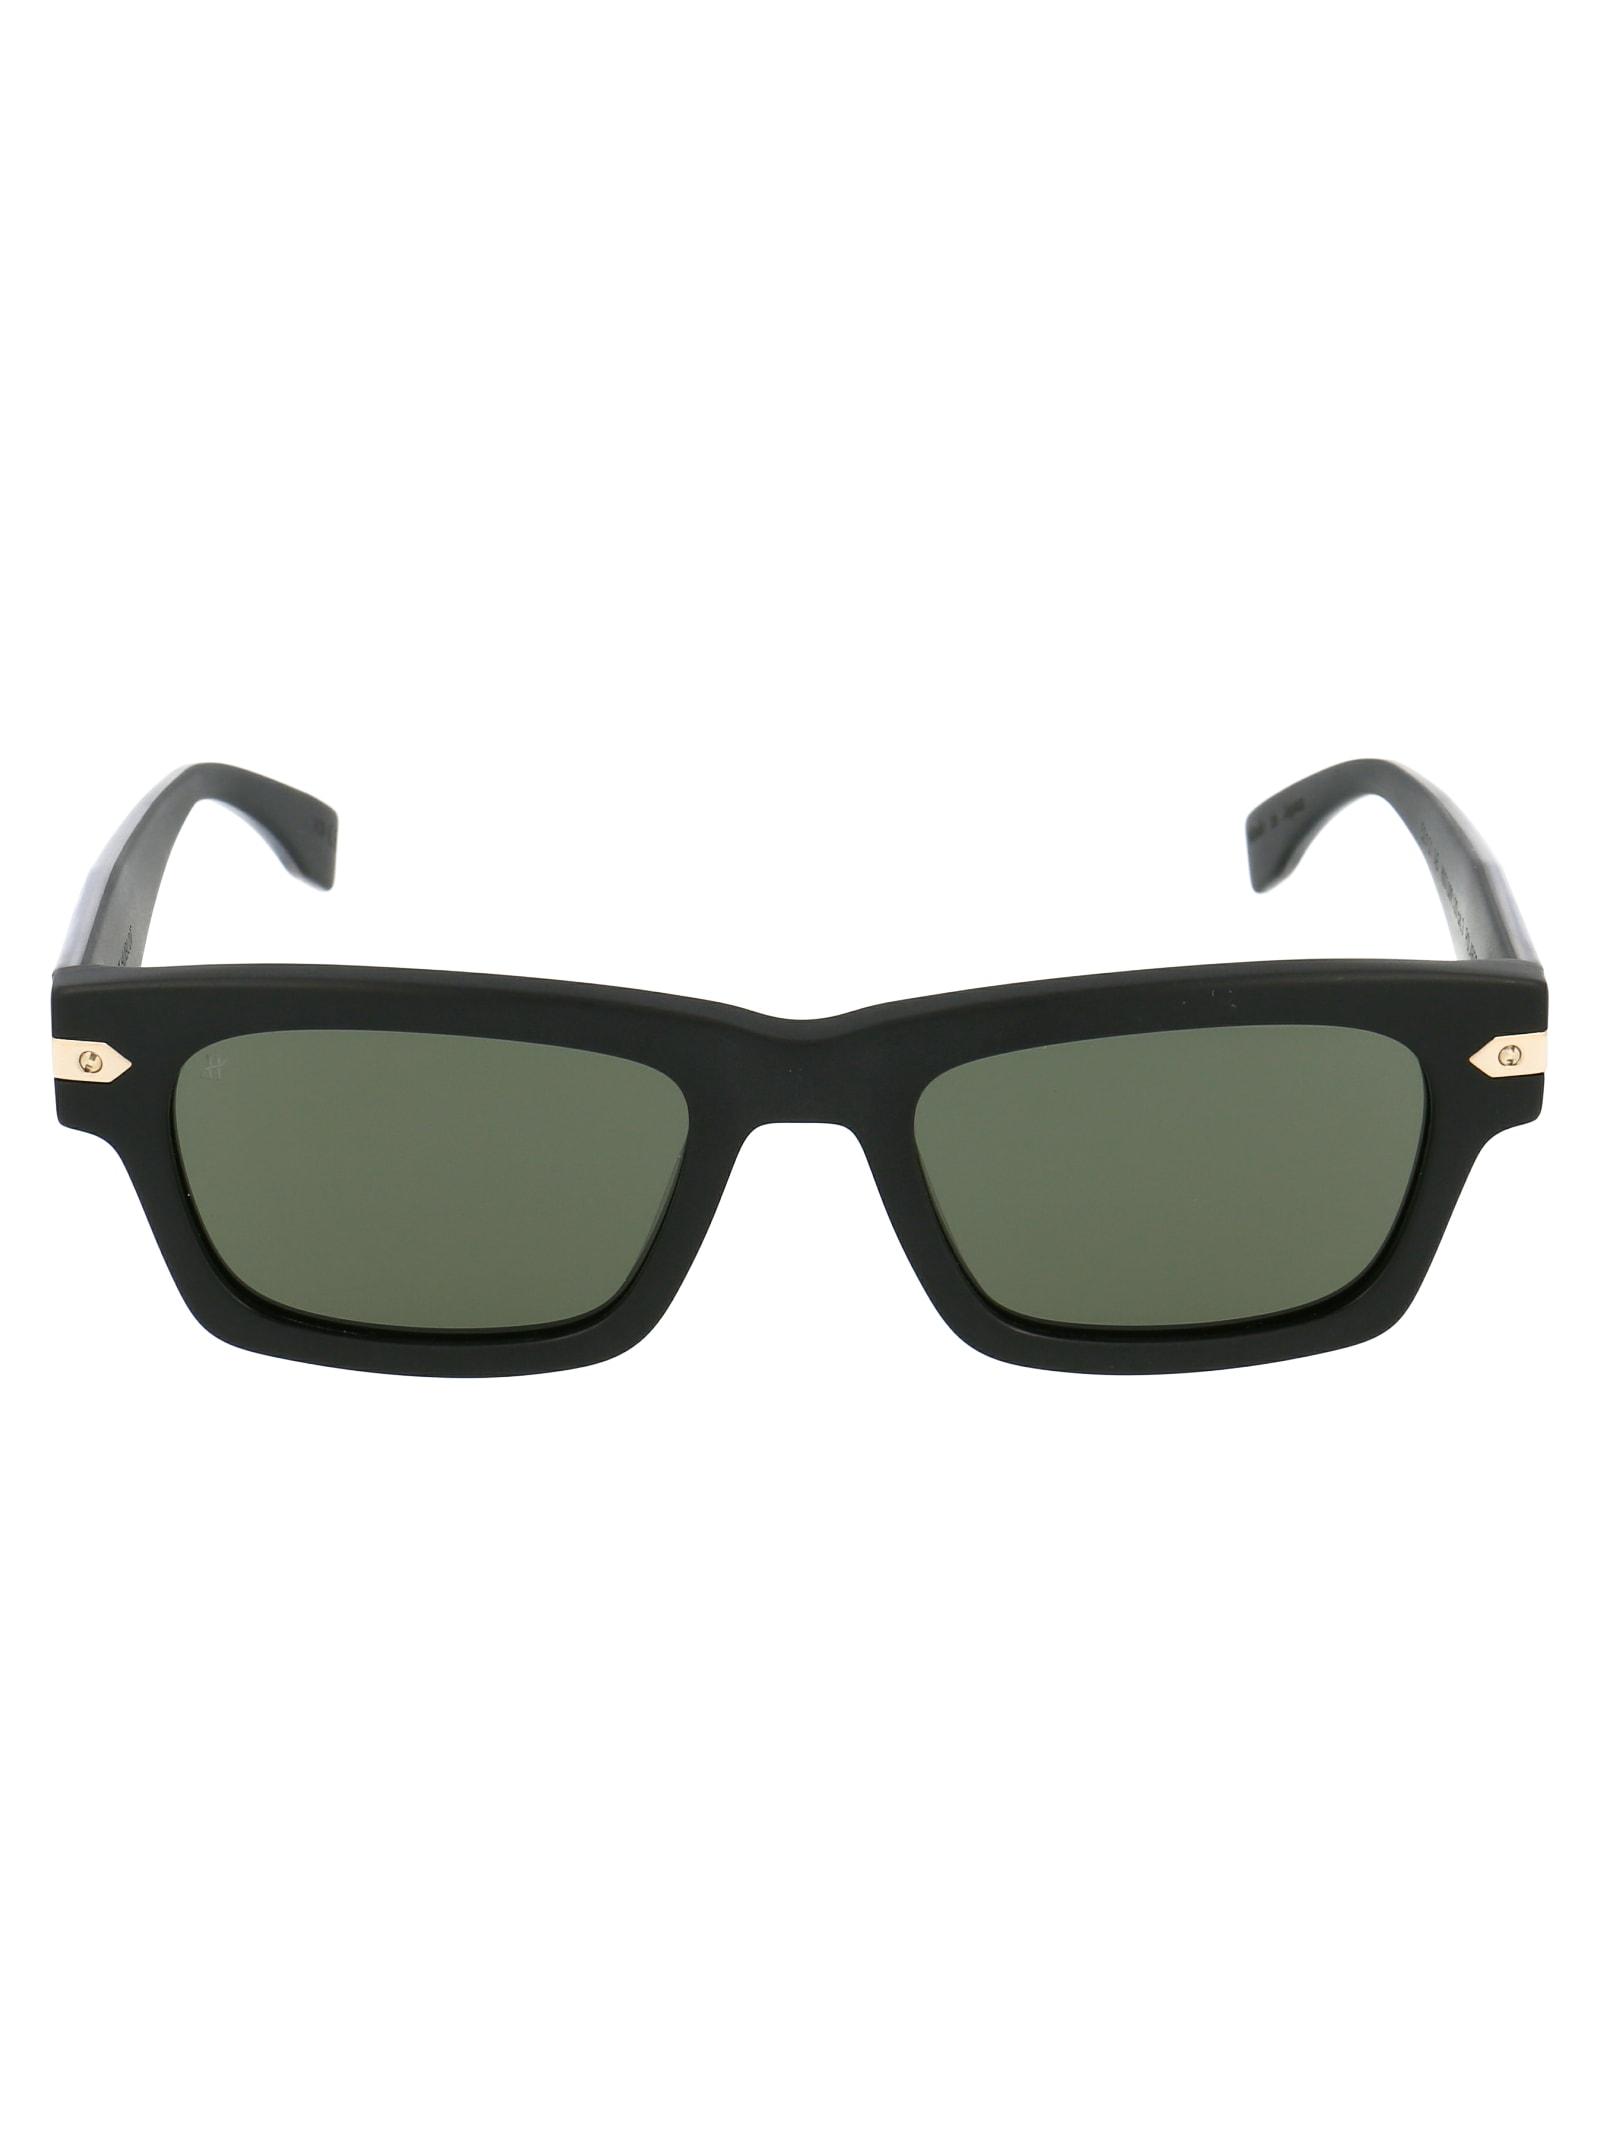 Hublot Sunglasses In Black & Gold